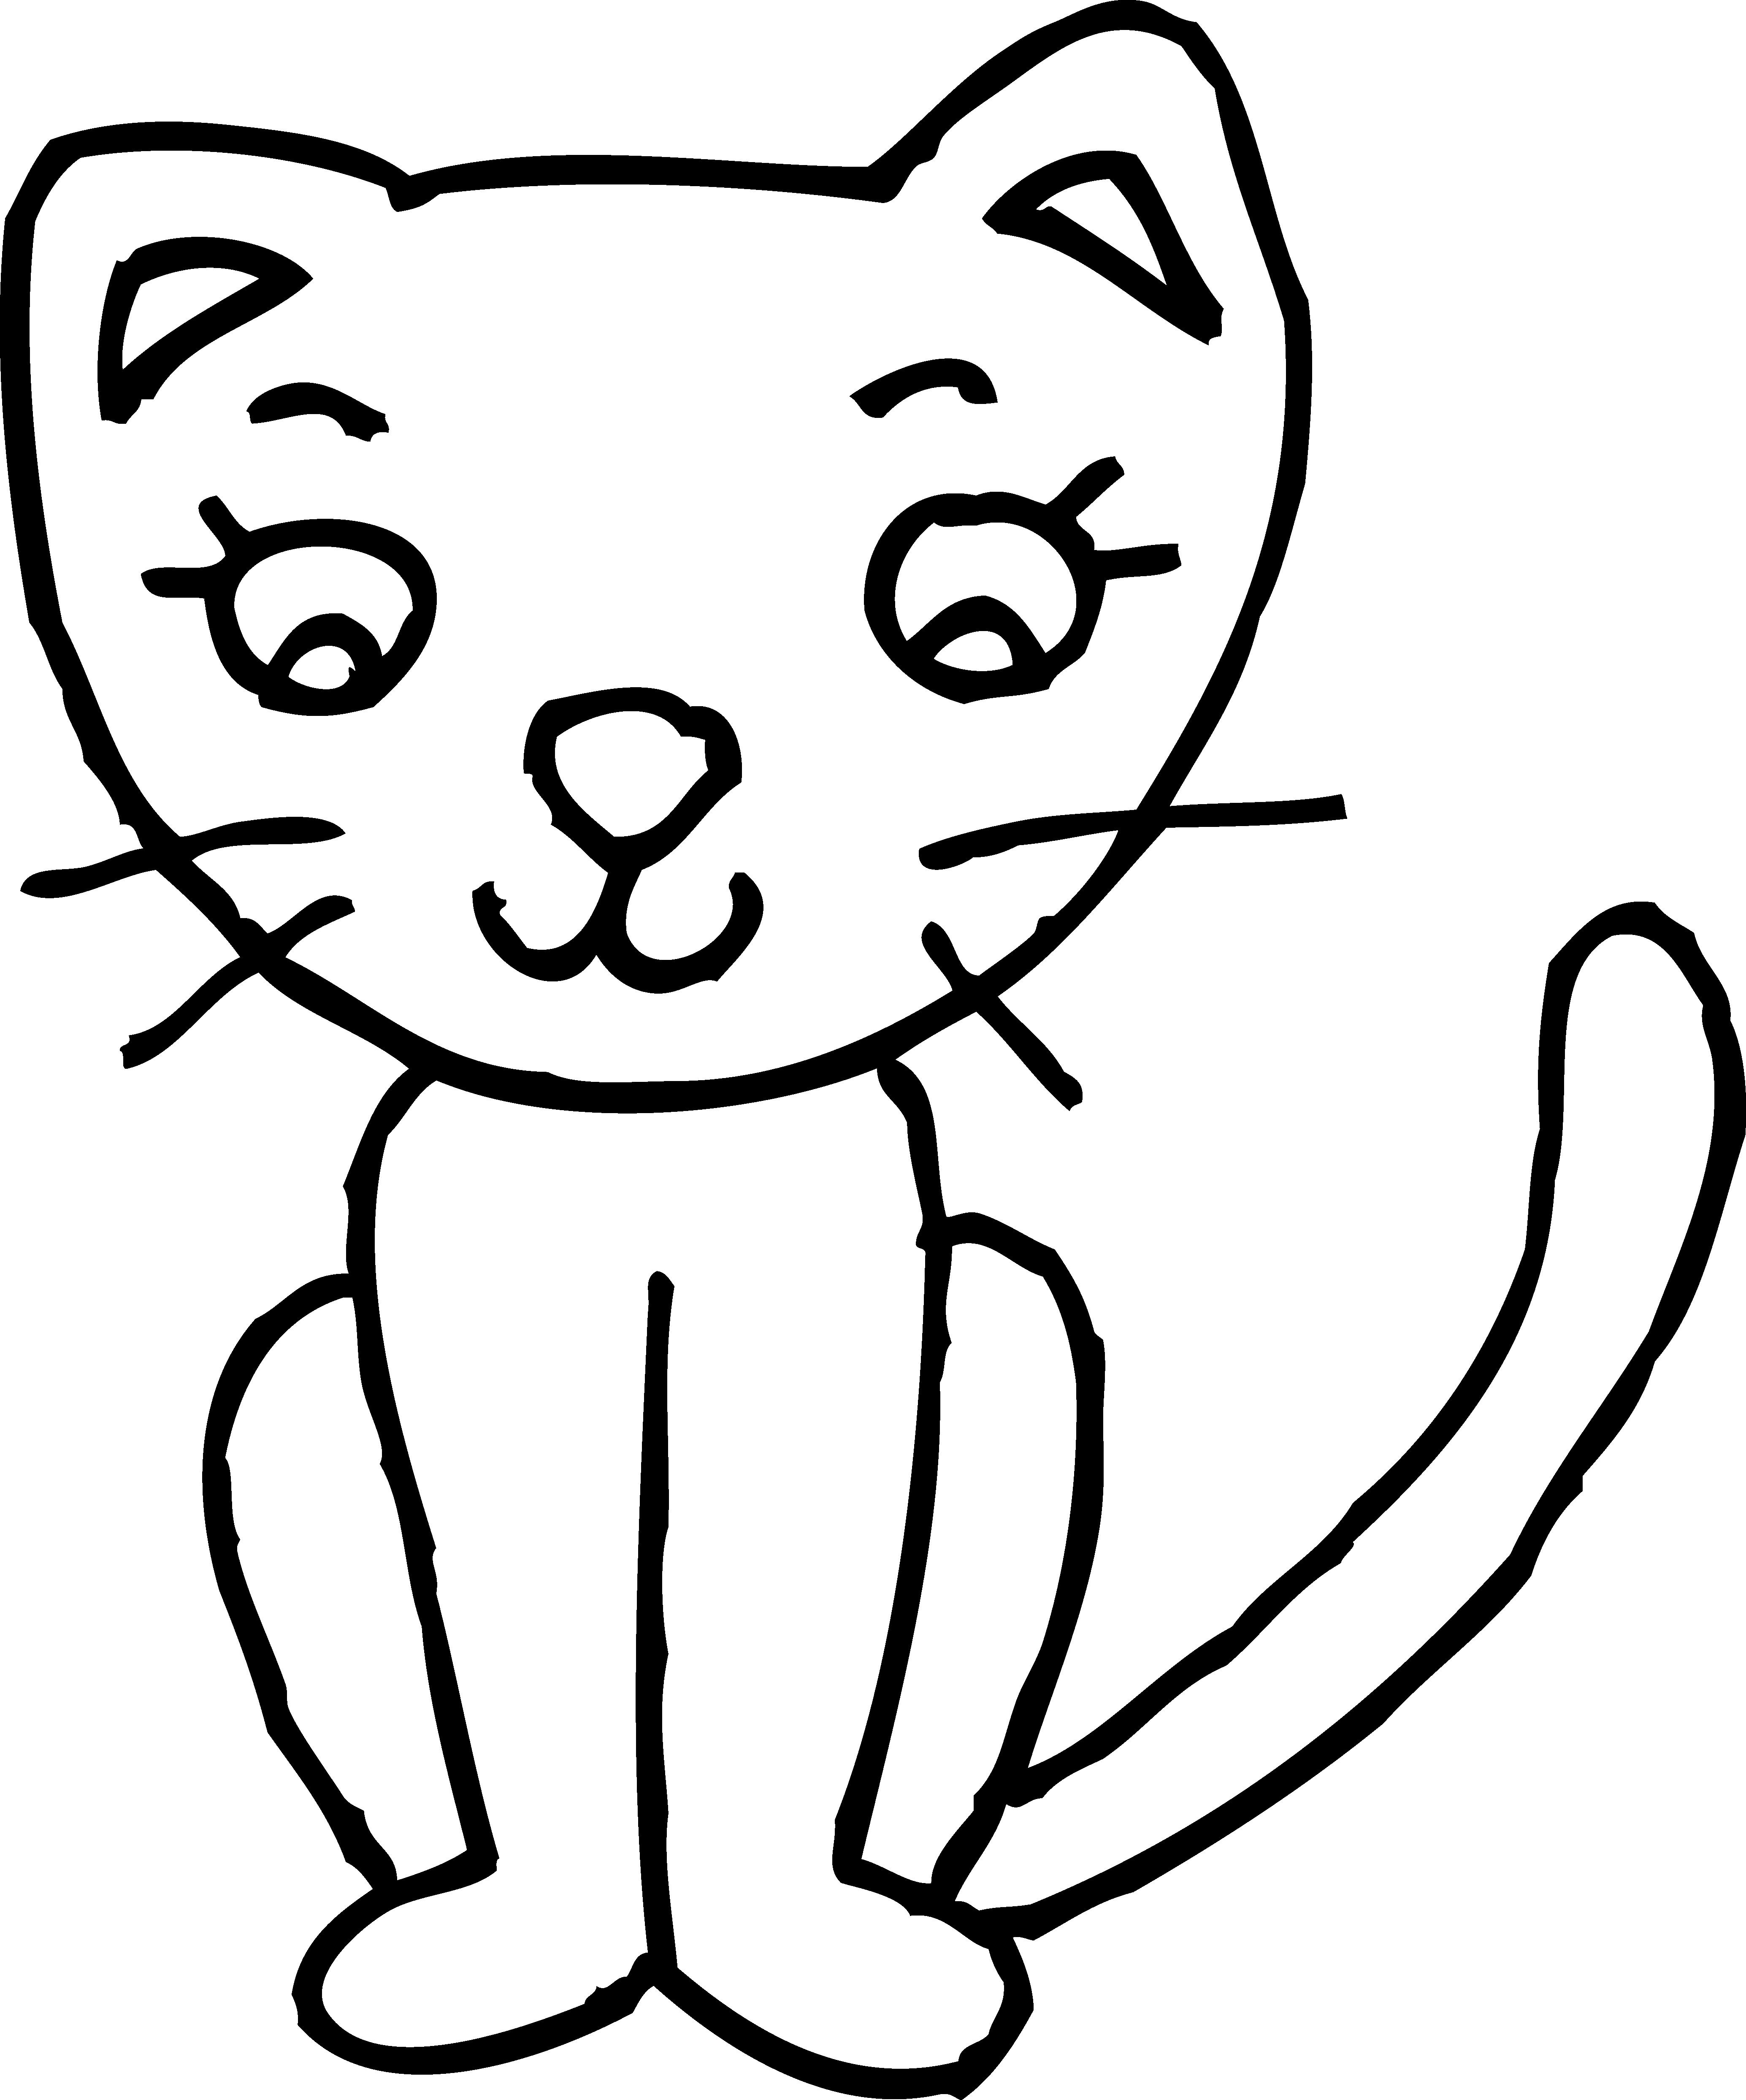 4137x4975 Clipart Of A Cat Clipartzo 2